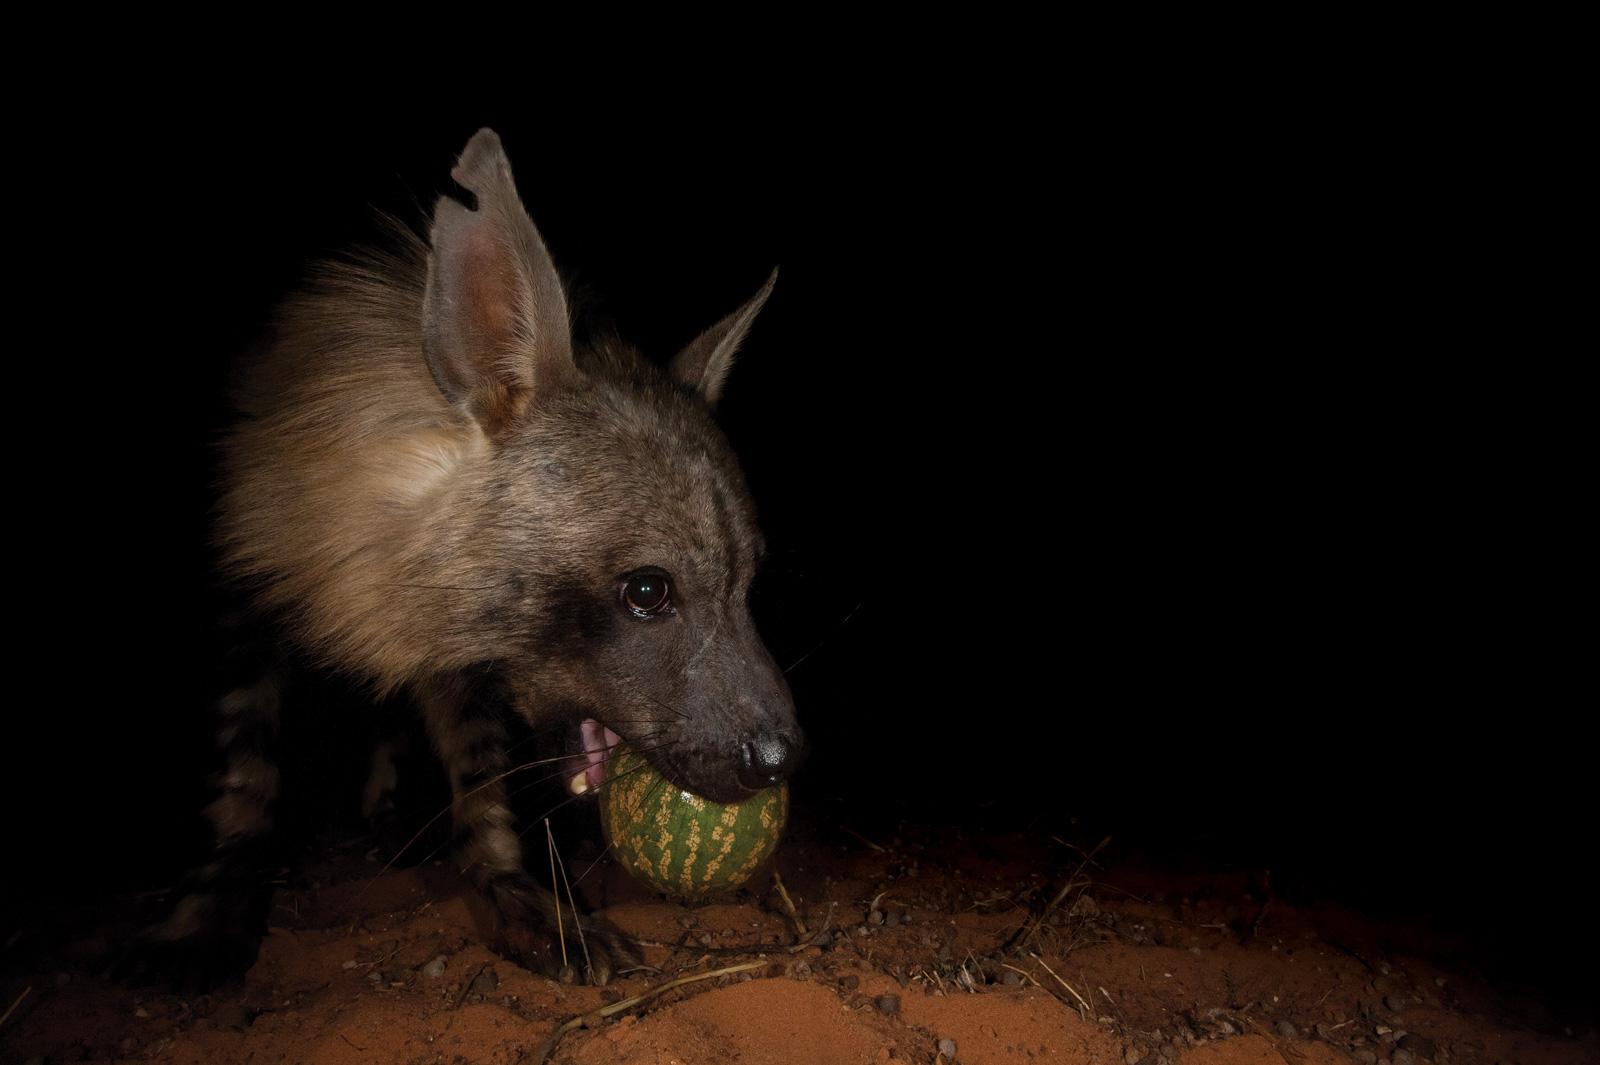 Hannes-Lochner-Kalahari-brown-hyena-apple